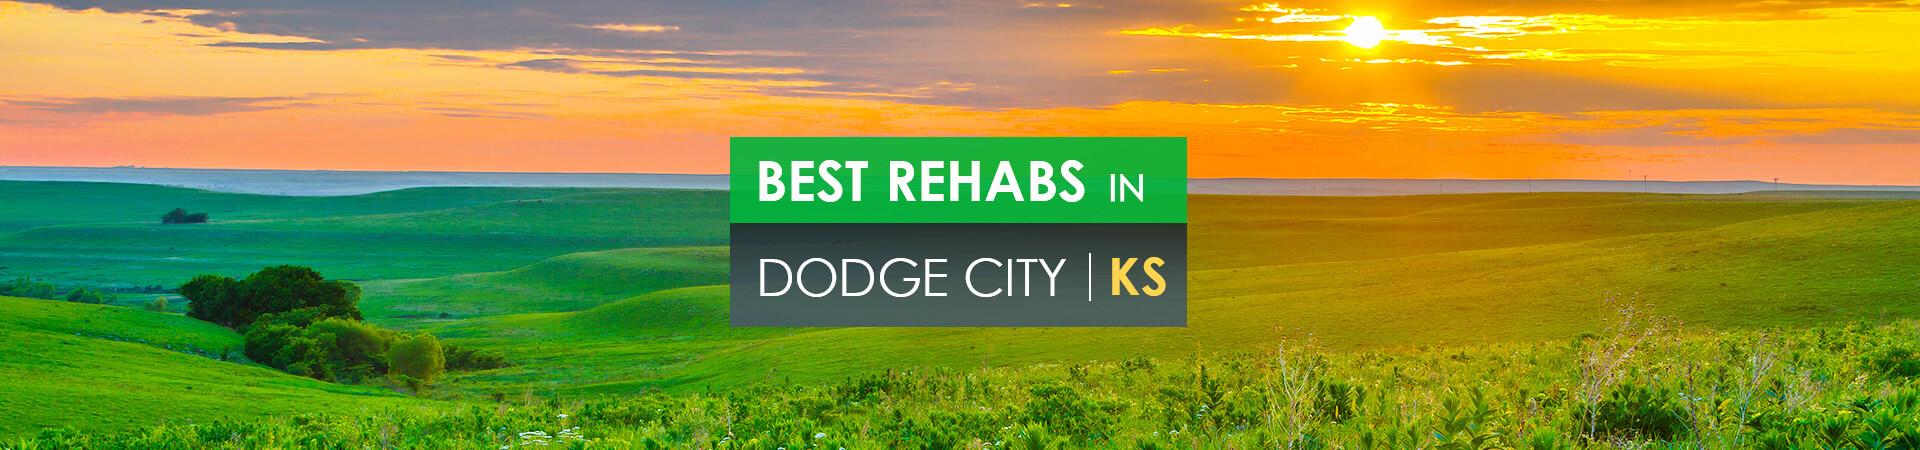 Best rehabs in Dodge City, KS